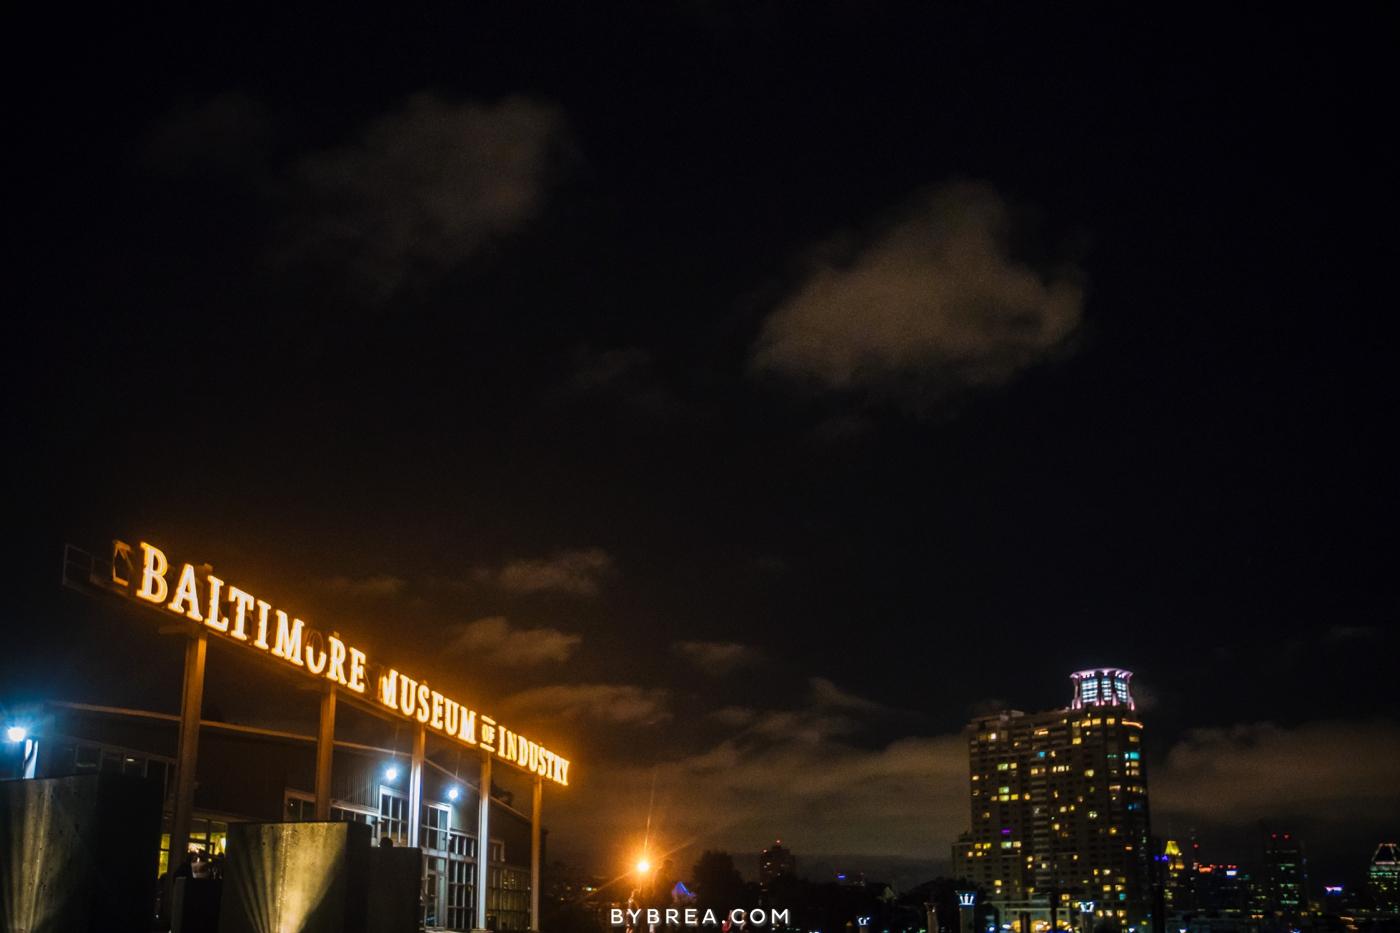 Baltimore Museum of Industry wedding photo skyline at night